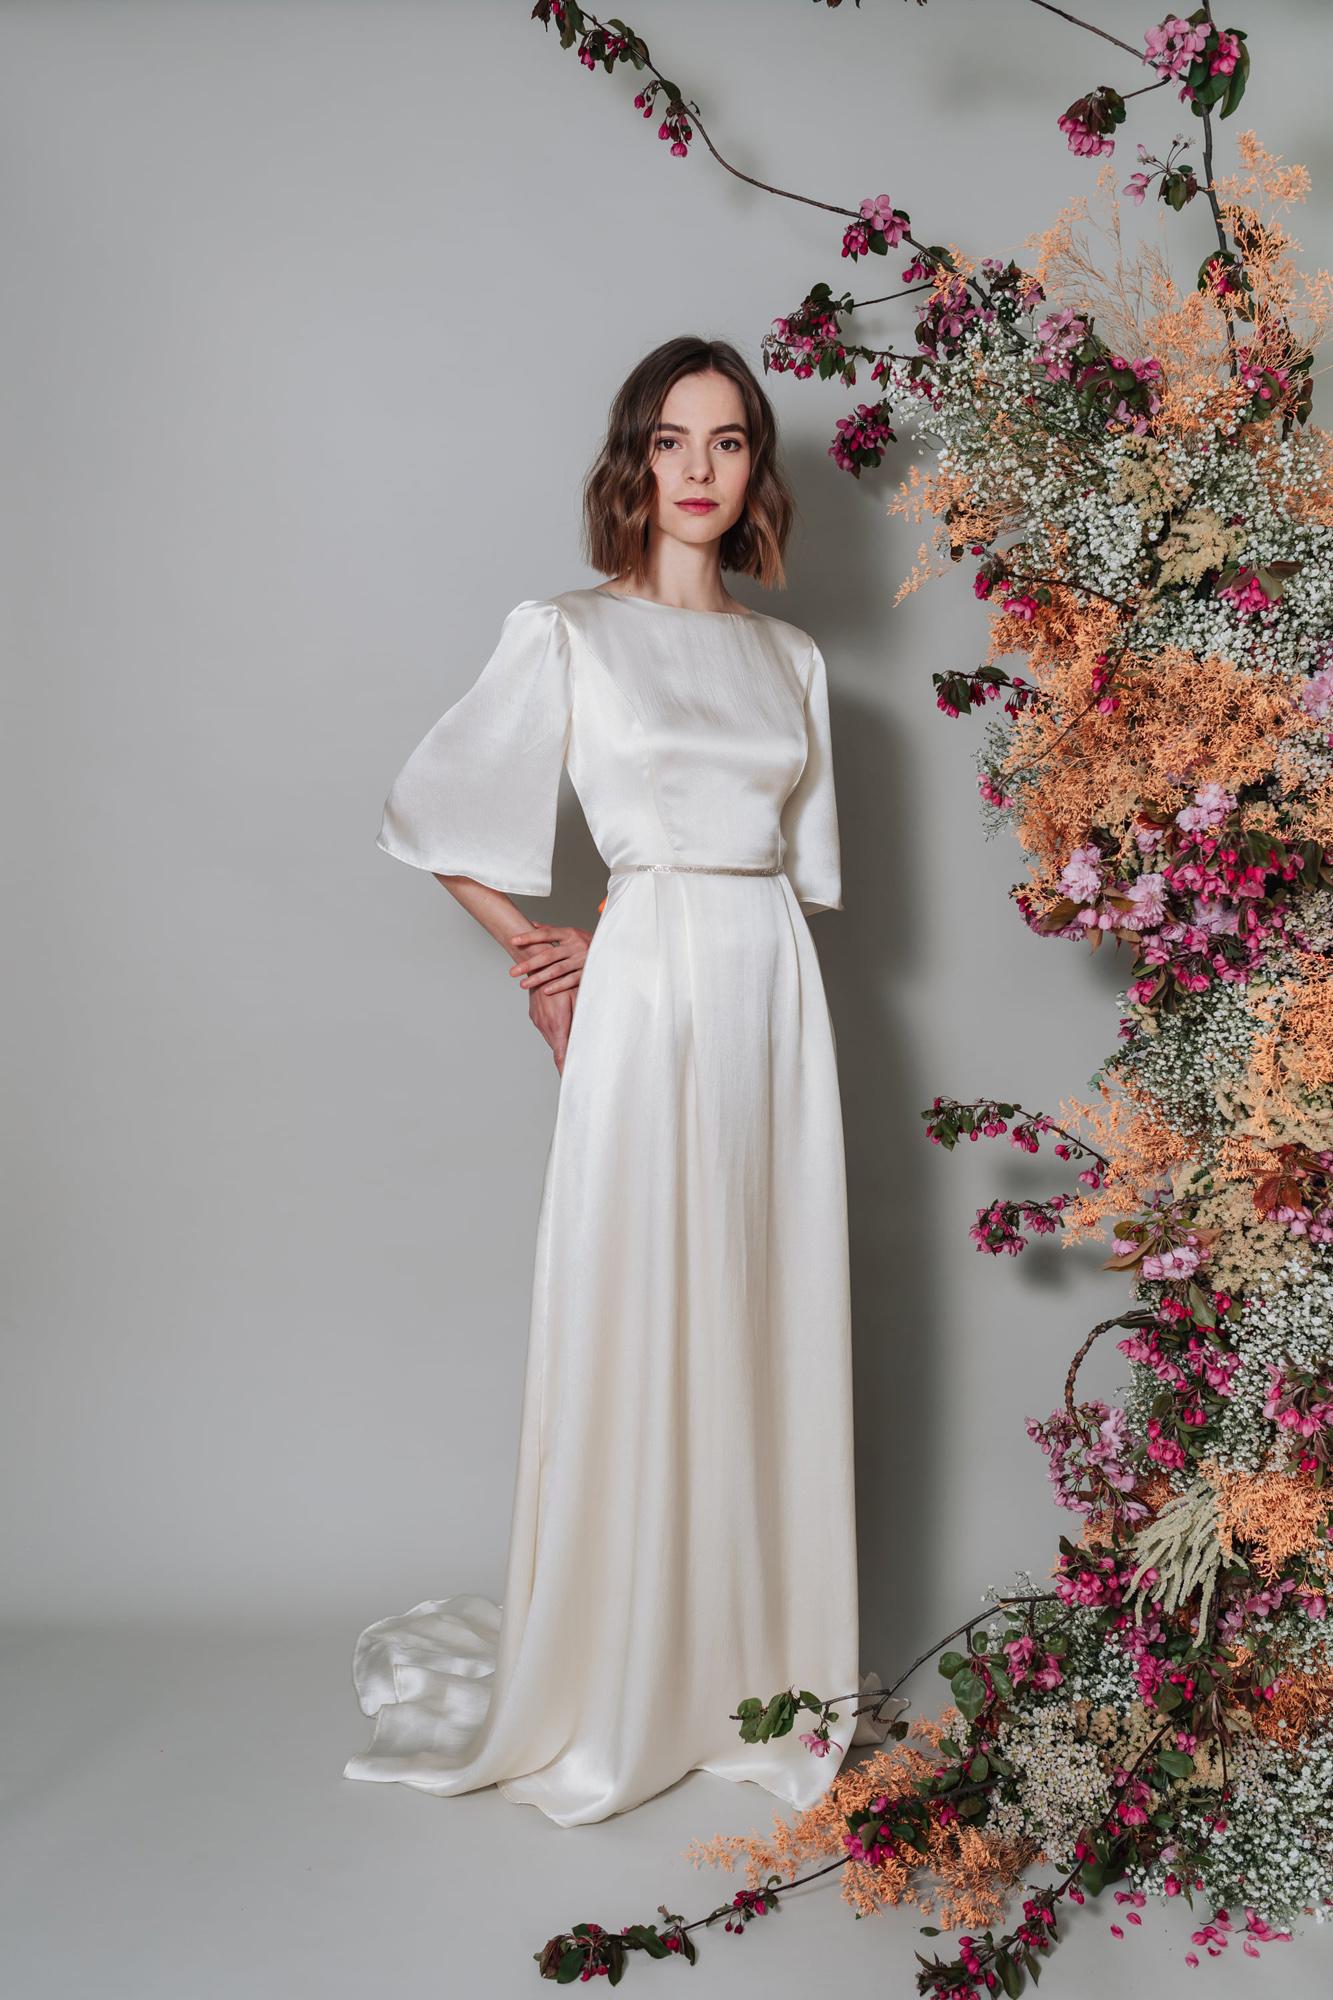 Kate-Beaumont-Lunaria-Bohemian-Hammered-Silk-Wedding-Dress-Sleeves-7.jpg